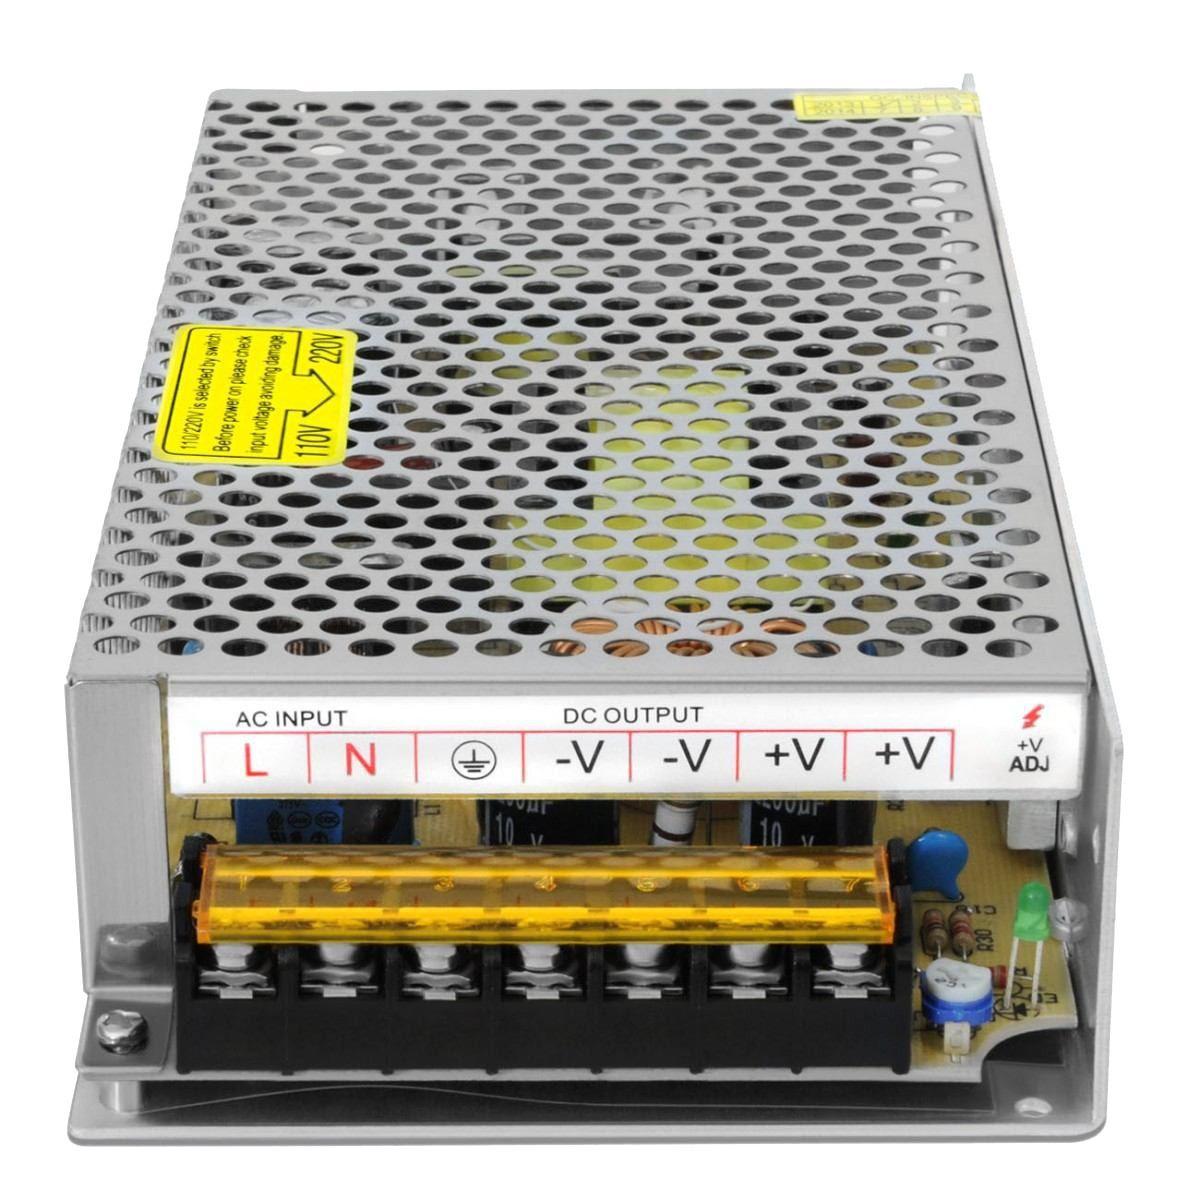 Kit Cftv 32 Câmeras Intelbras 1010b + Dvr 5em1 1032 + Hd 4tb